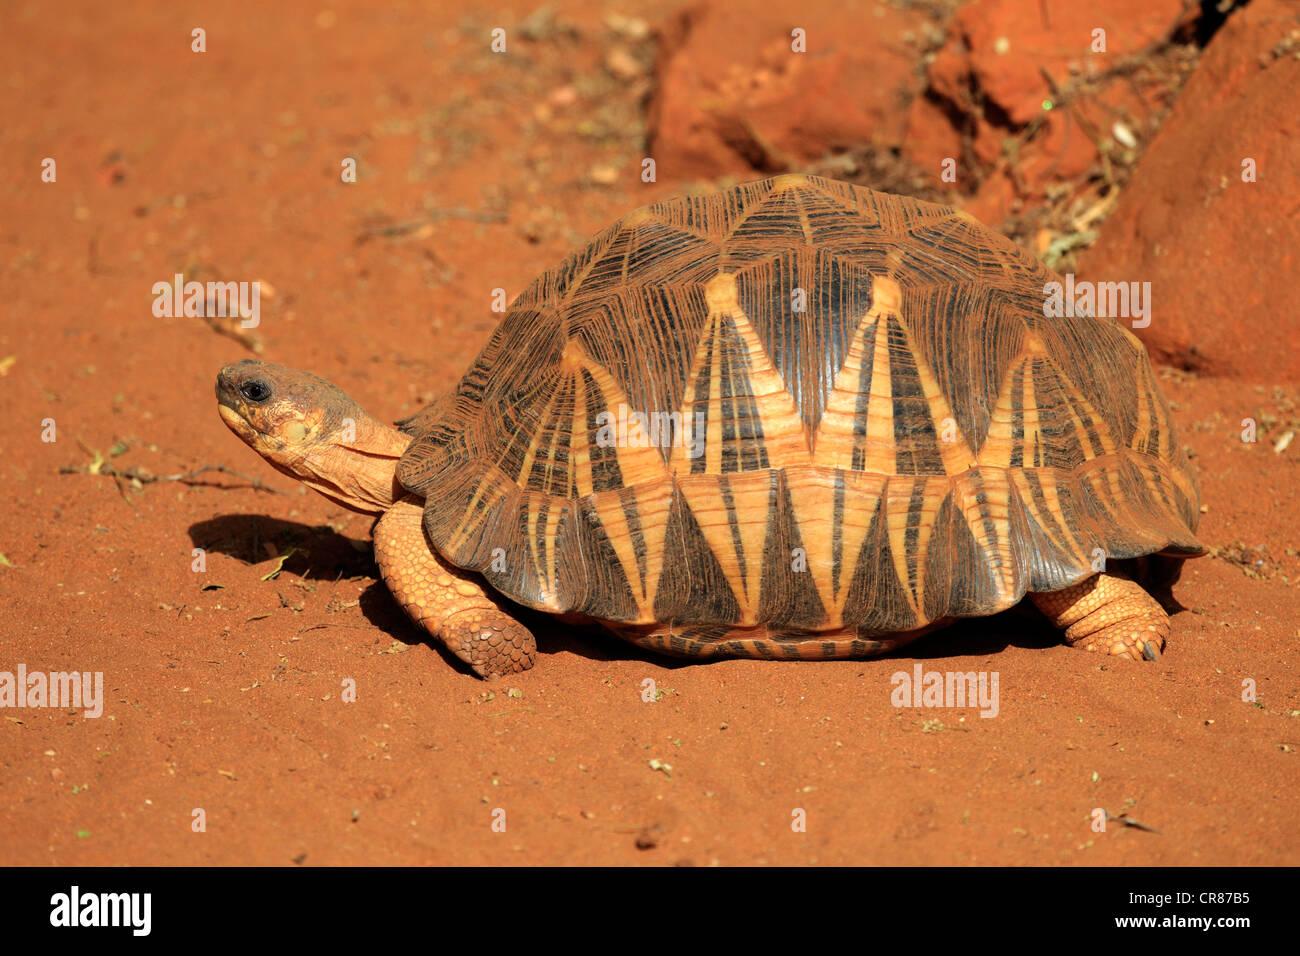 Madagascan Radiated Tortoise (Geochelone radiata), Berenty Reserve, Madagascar, Africa - Stock Image